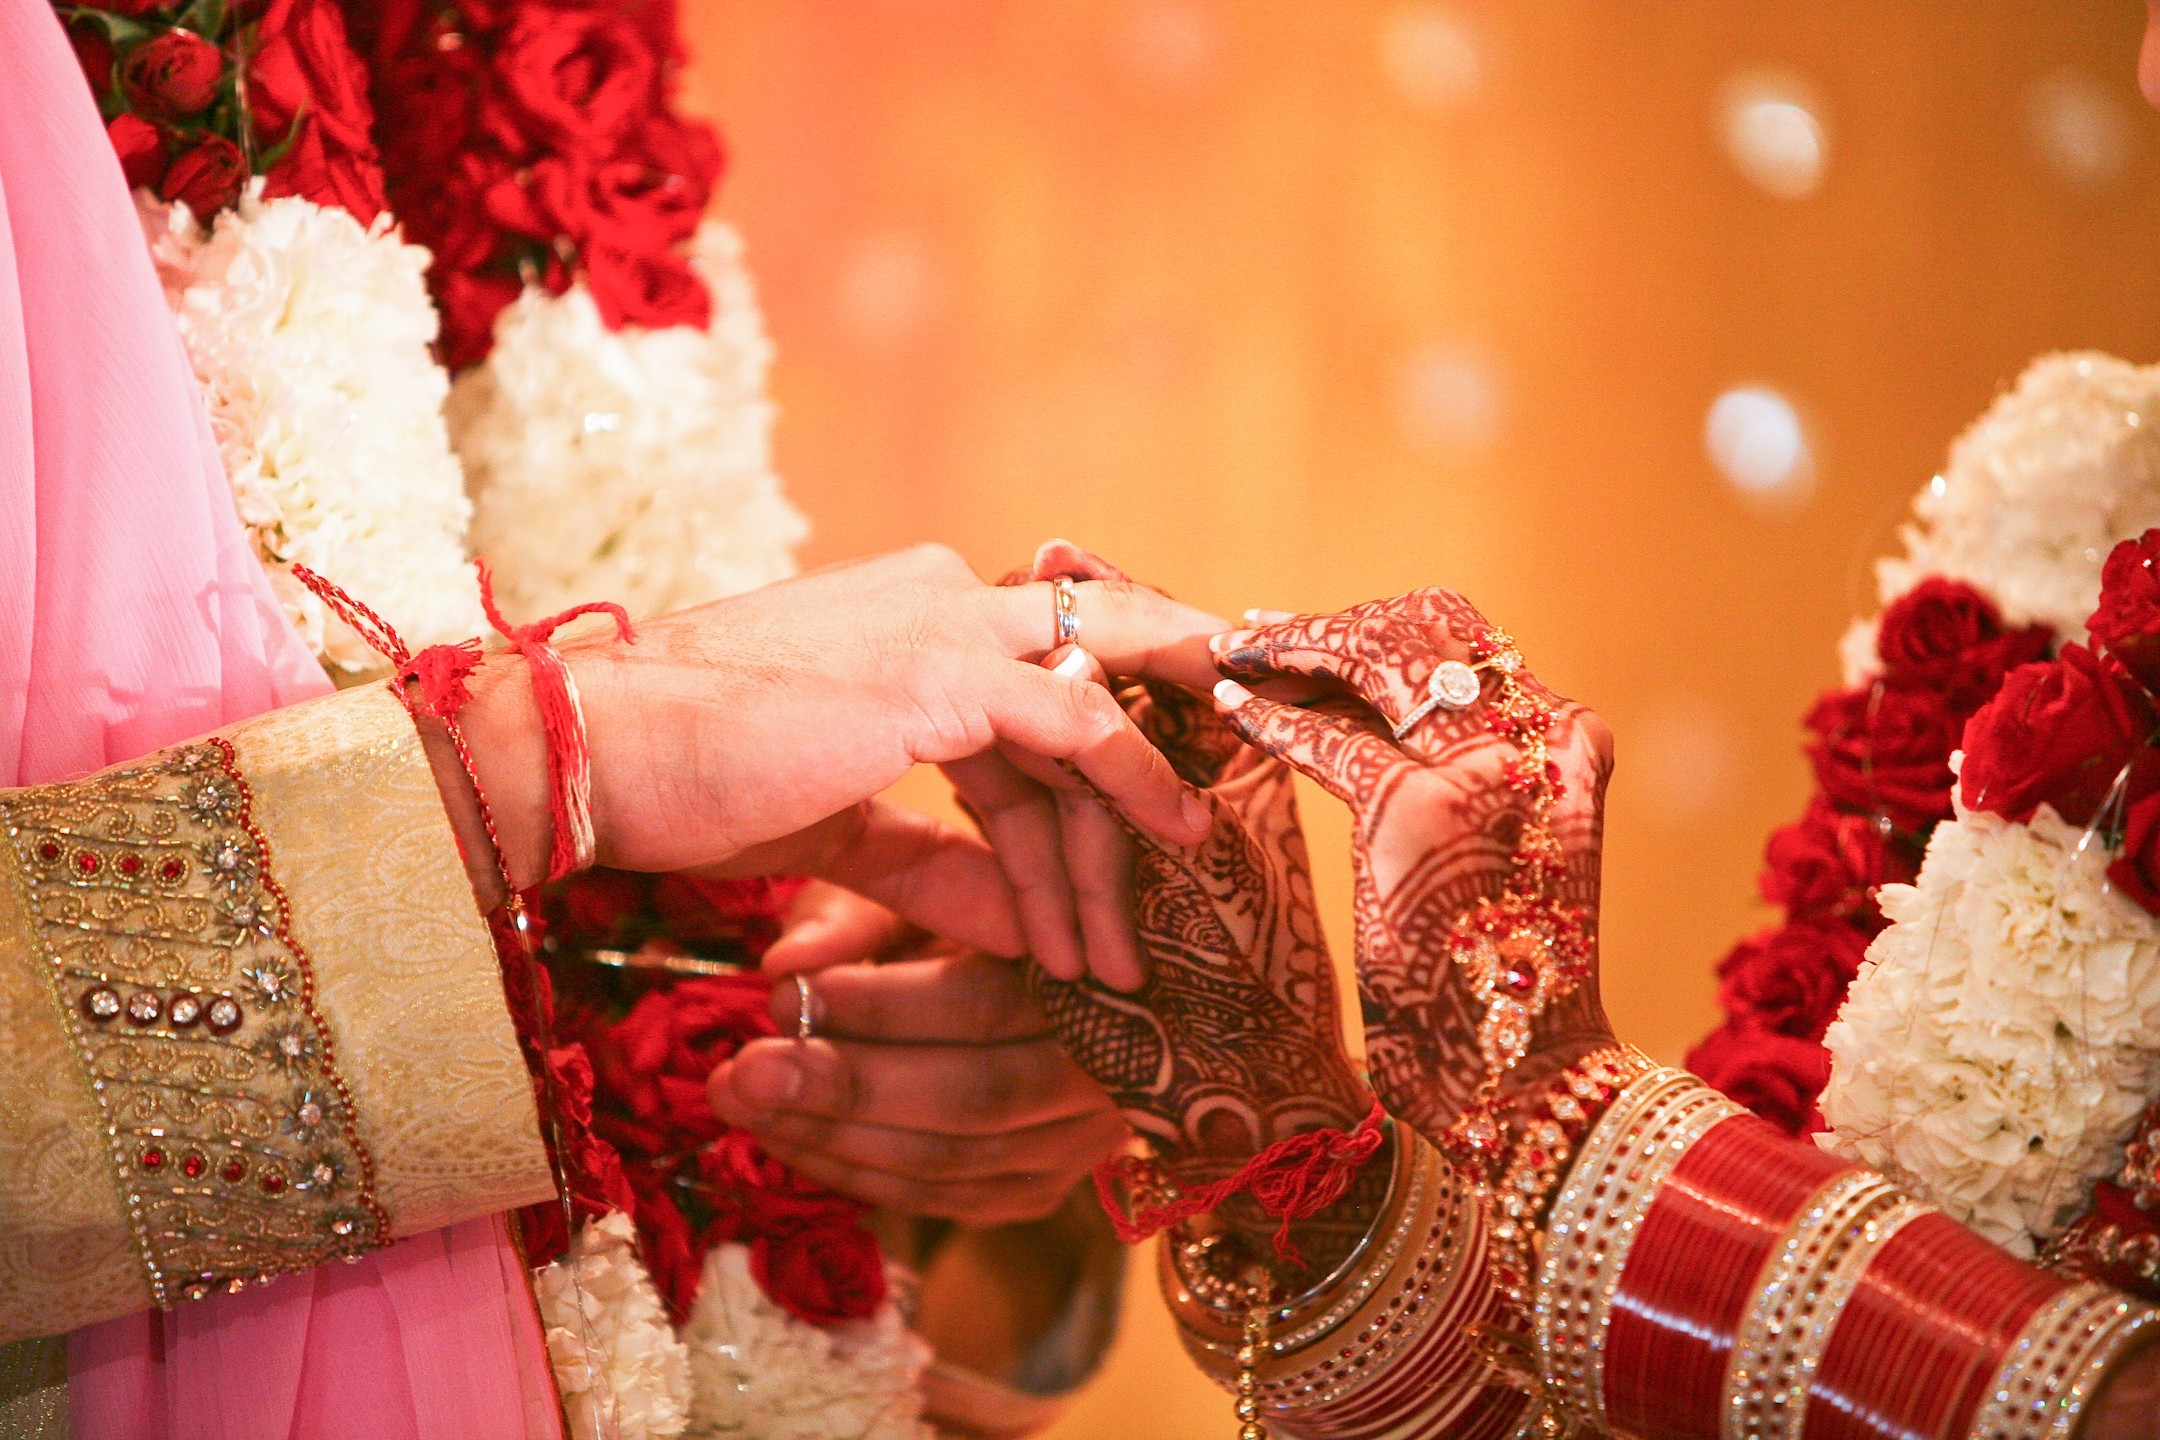 Wedding Background Images (60+ images)